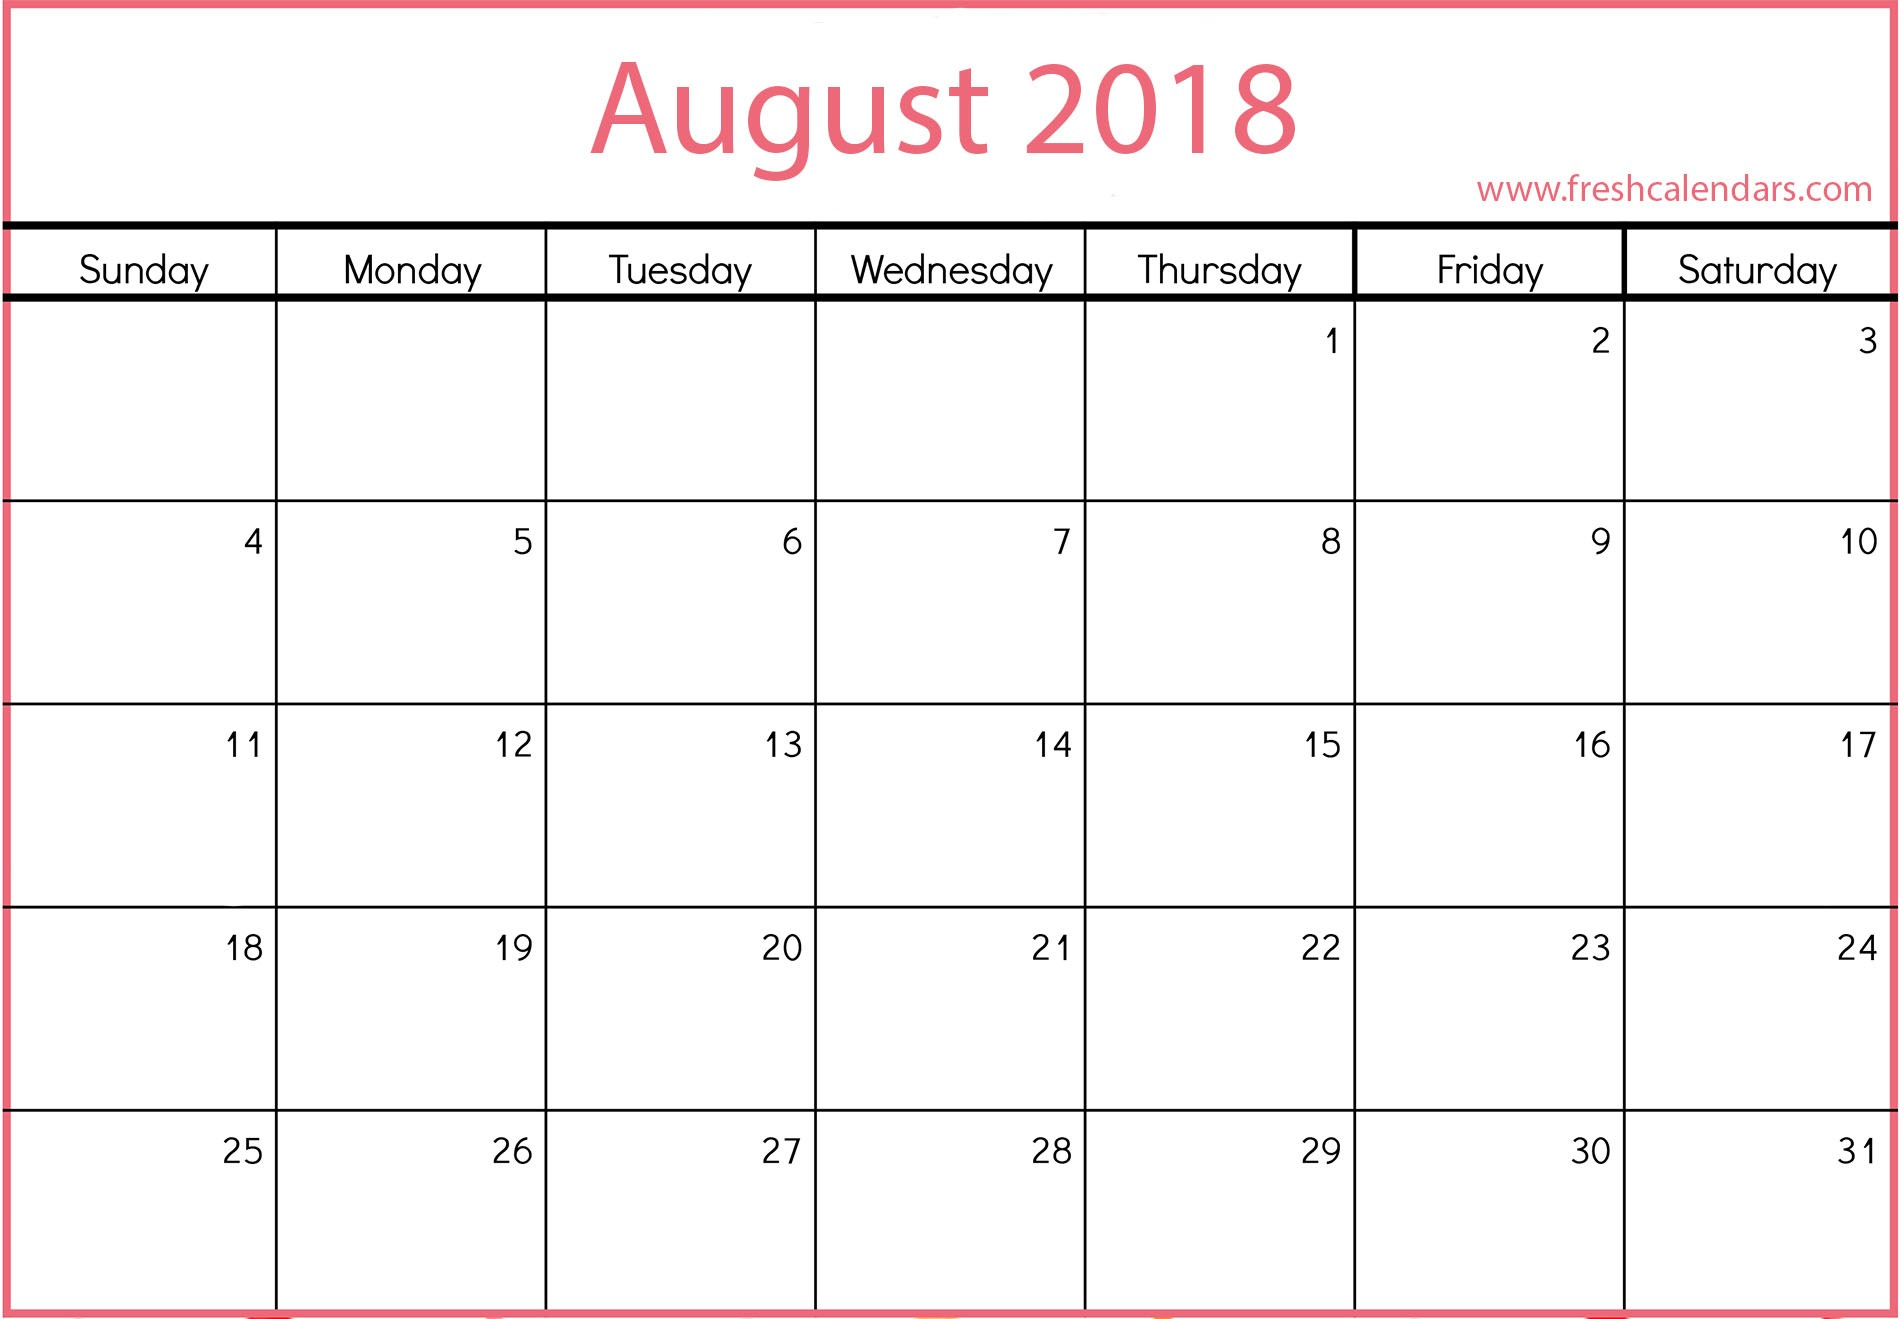 2019 Calendar by Month Printable August 2019 Calendar Printable Fresh Calendars